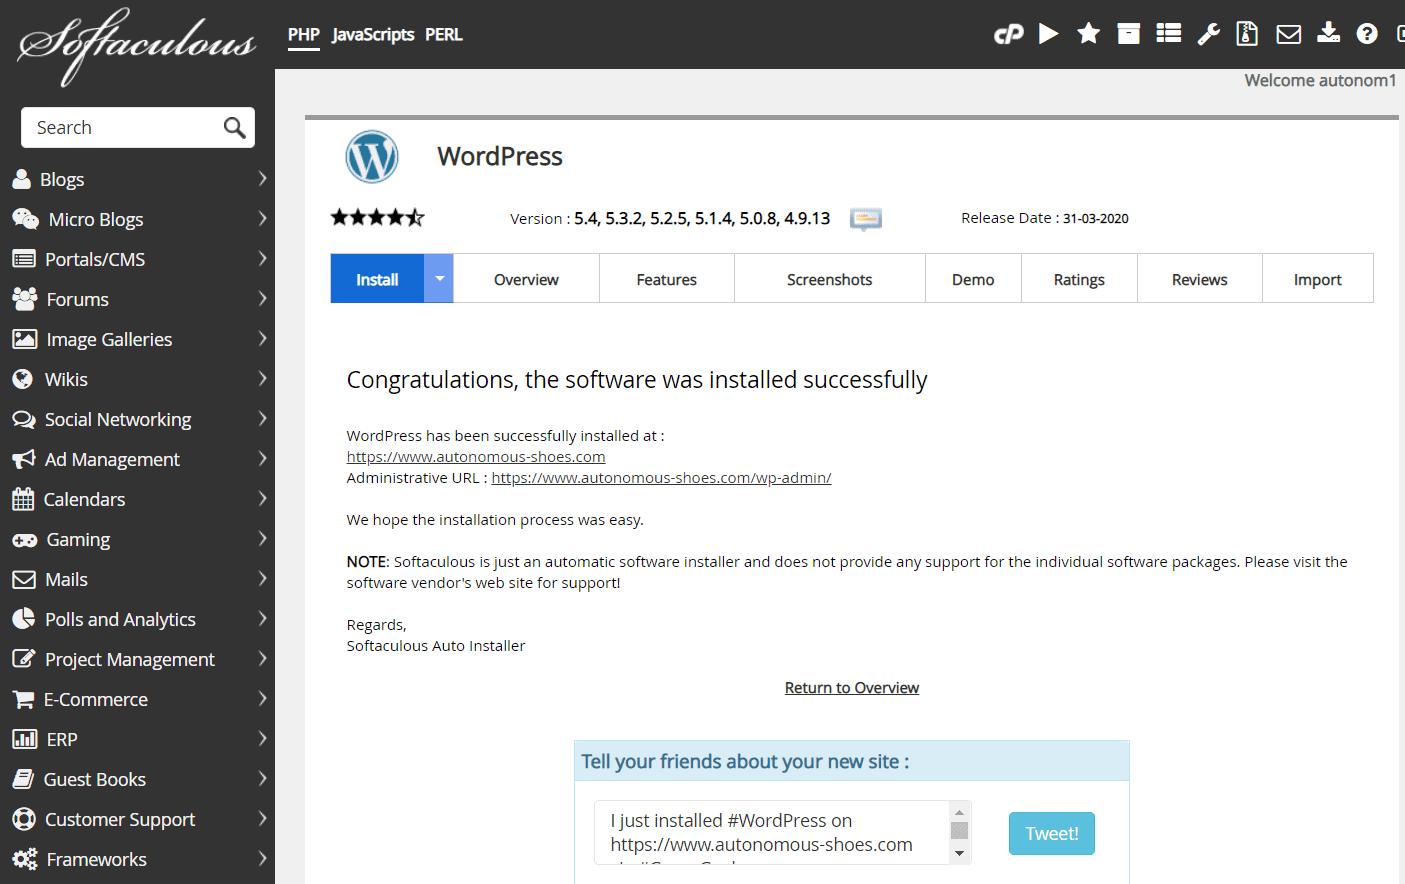 a successful WordPress installation